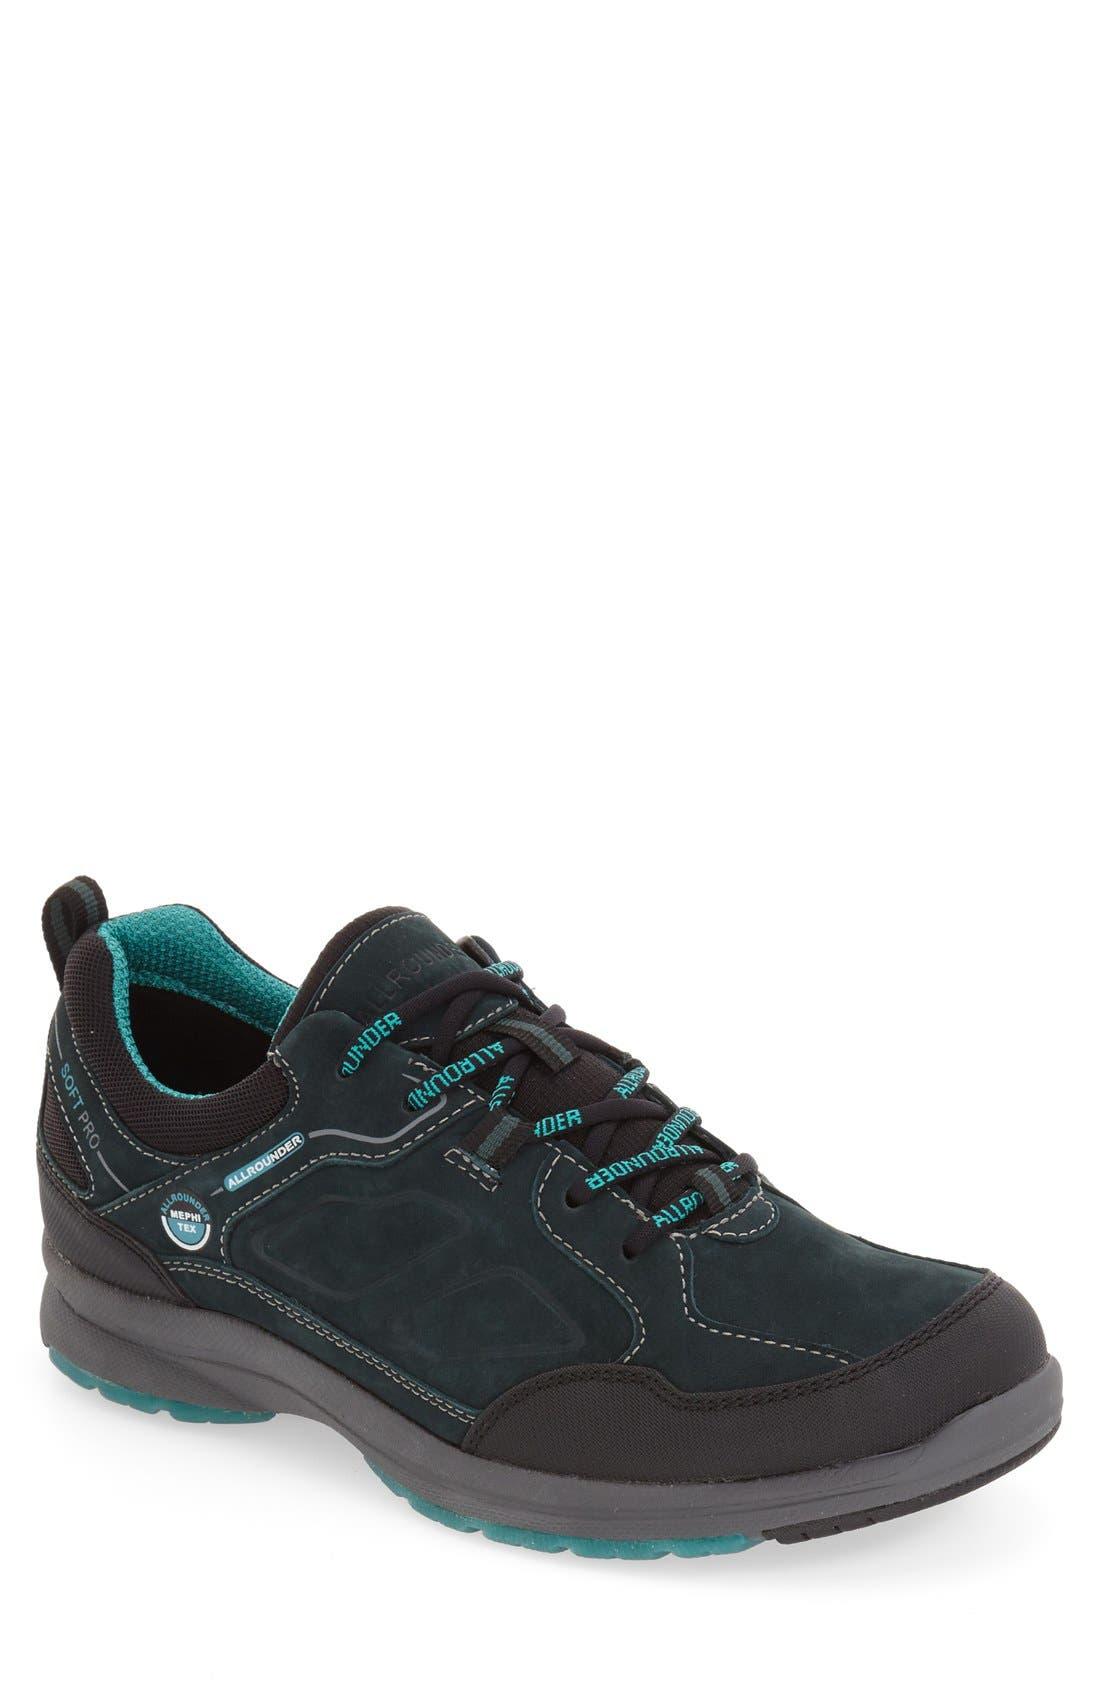 'Dascha Tex' Waterproof Sneaker,                         Main,                         color, Black/ Olive Nubuck Leather